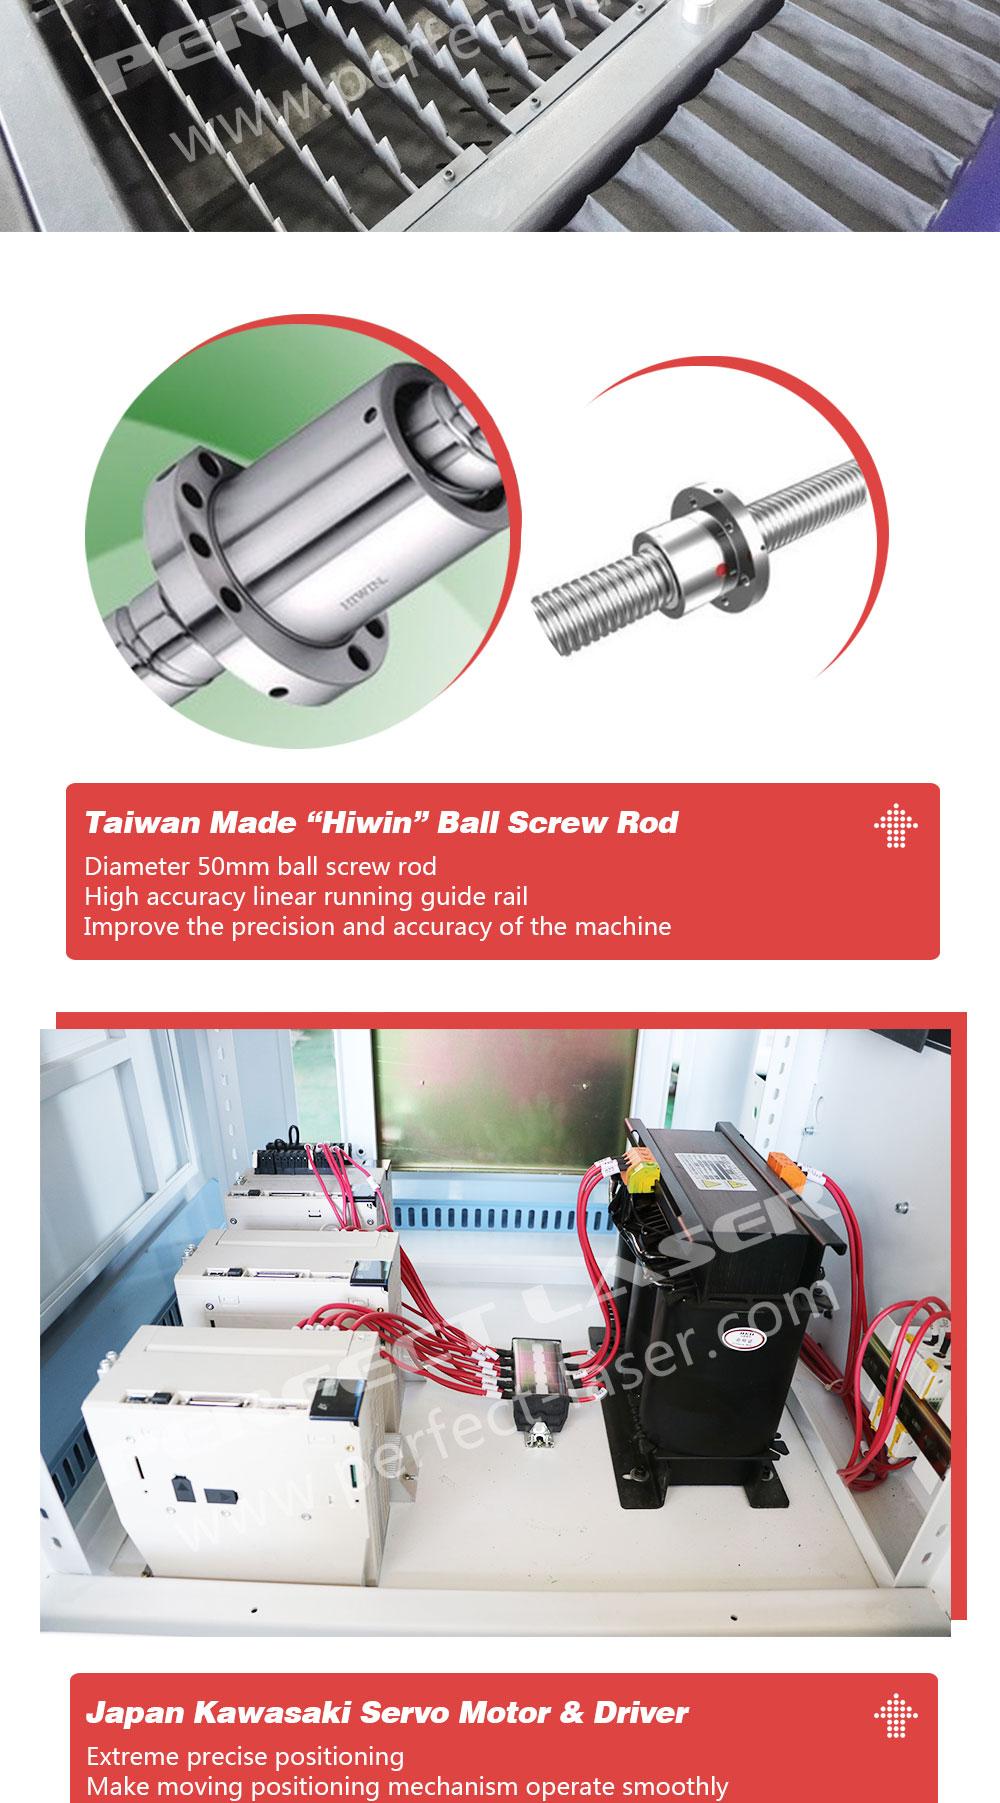 09 Perfect Laser-Fiber Laser Cutting Machine.jpg